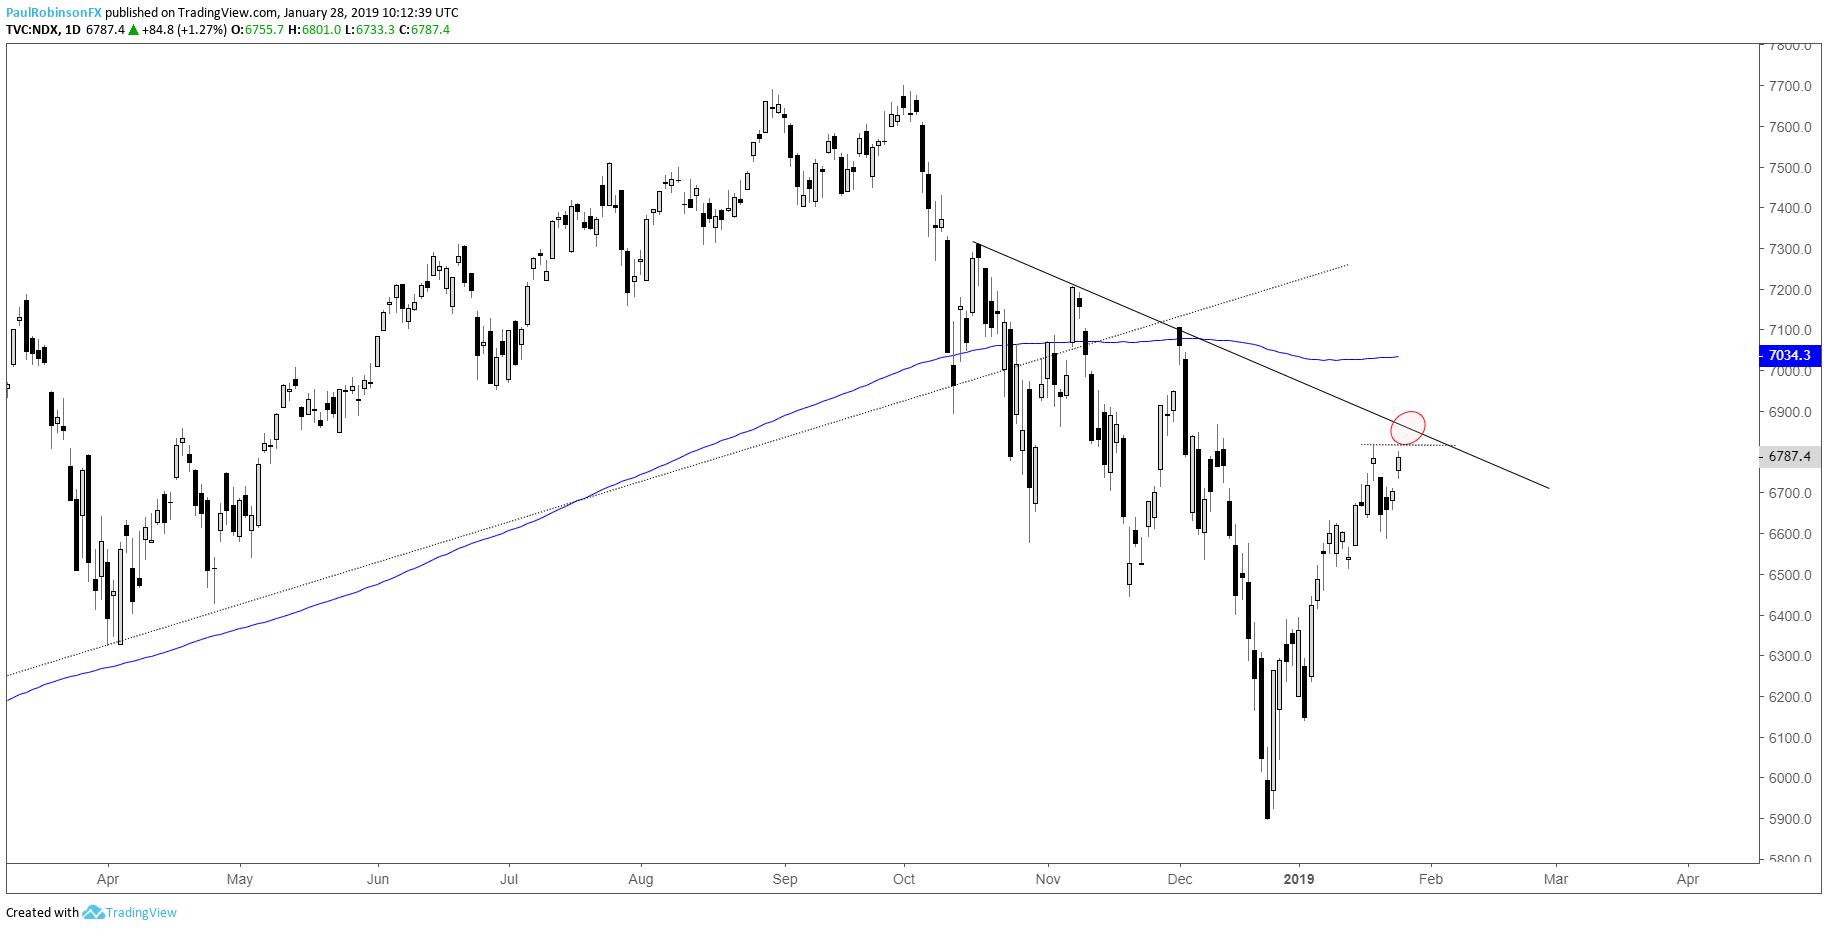 S&P 500, Dow Jones, and Nasdaq 100 Charts Near Resistance